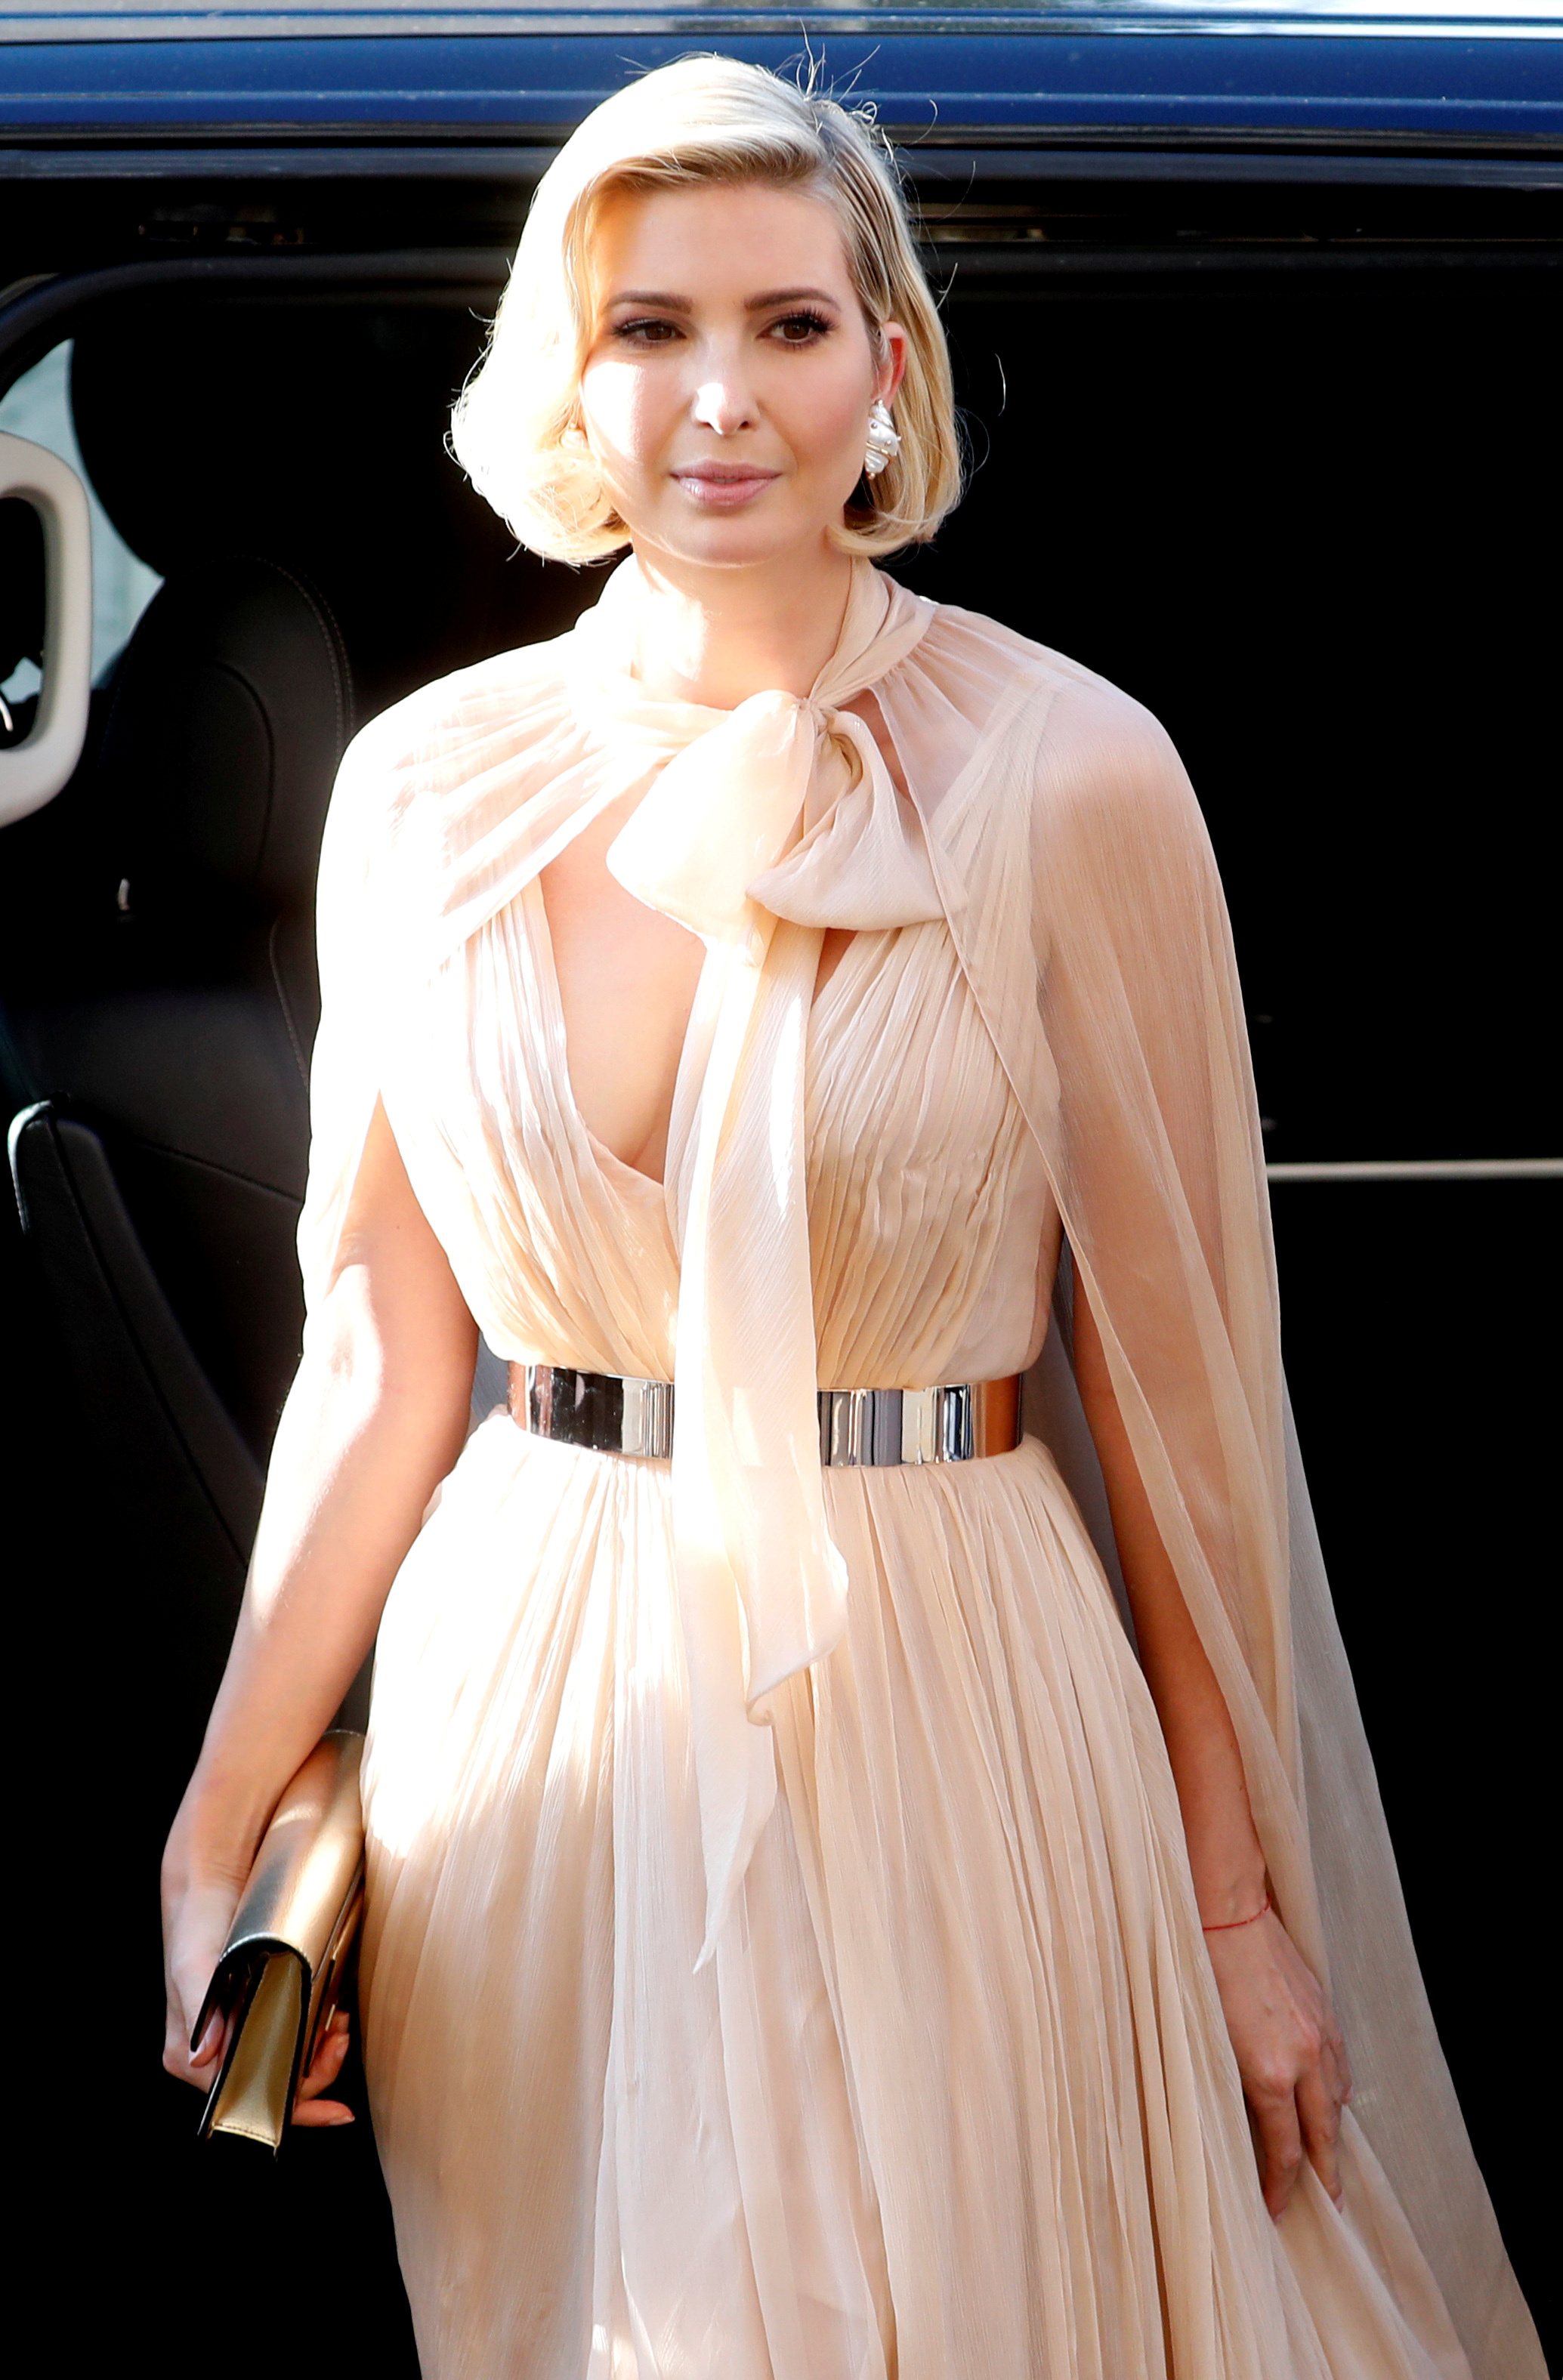 Ivanka Trump arrives to attend the wedding of fashion designer Misha Nonoo at Villa Aurelia in Rome, Italy, September 20, 2019. REUTERS/Remo Casilli